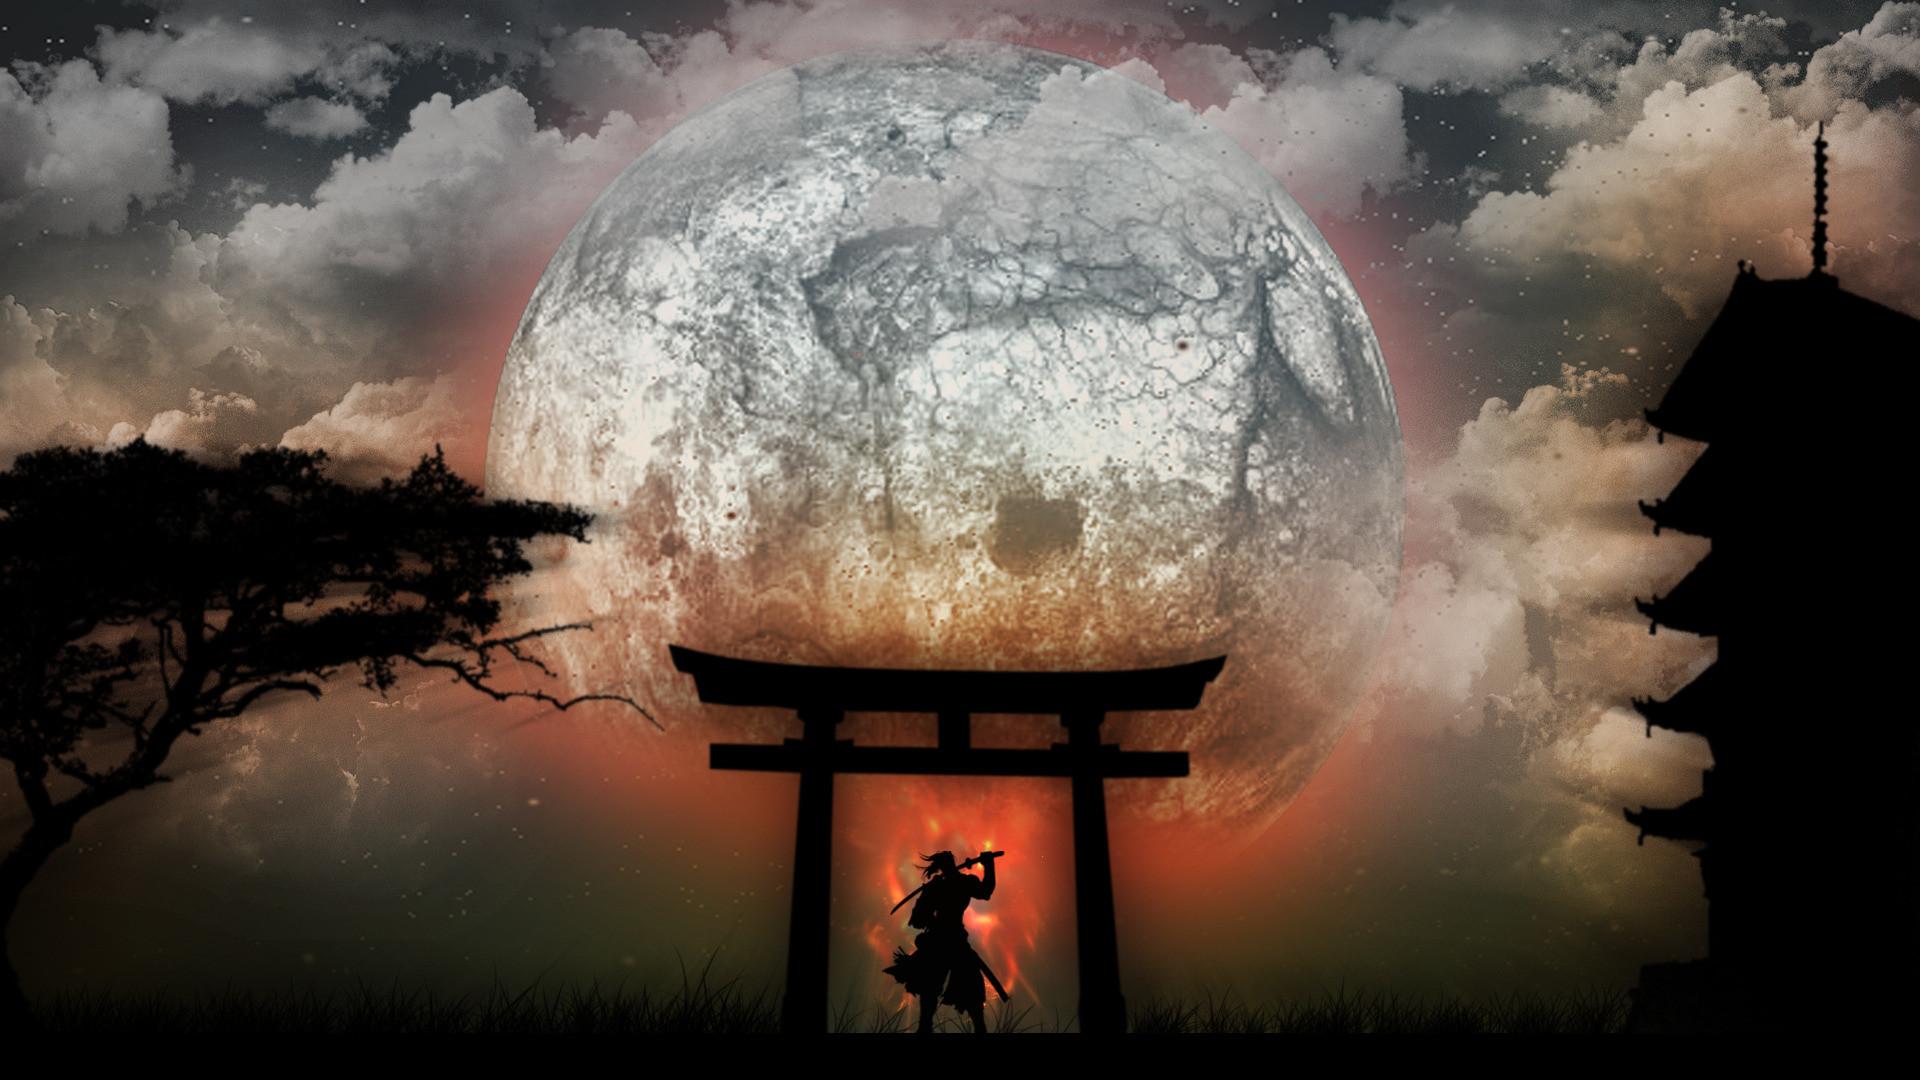 Night samurai HD Wallpaper 1920×1080